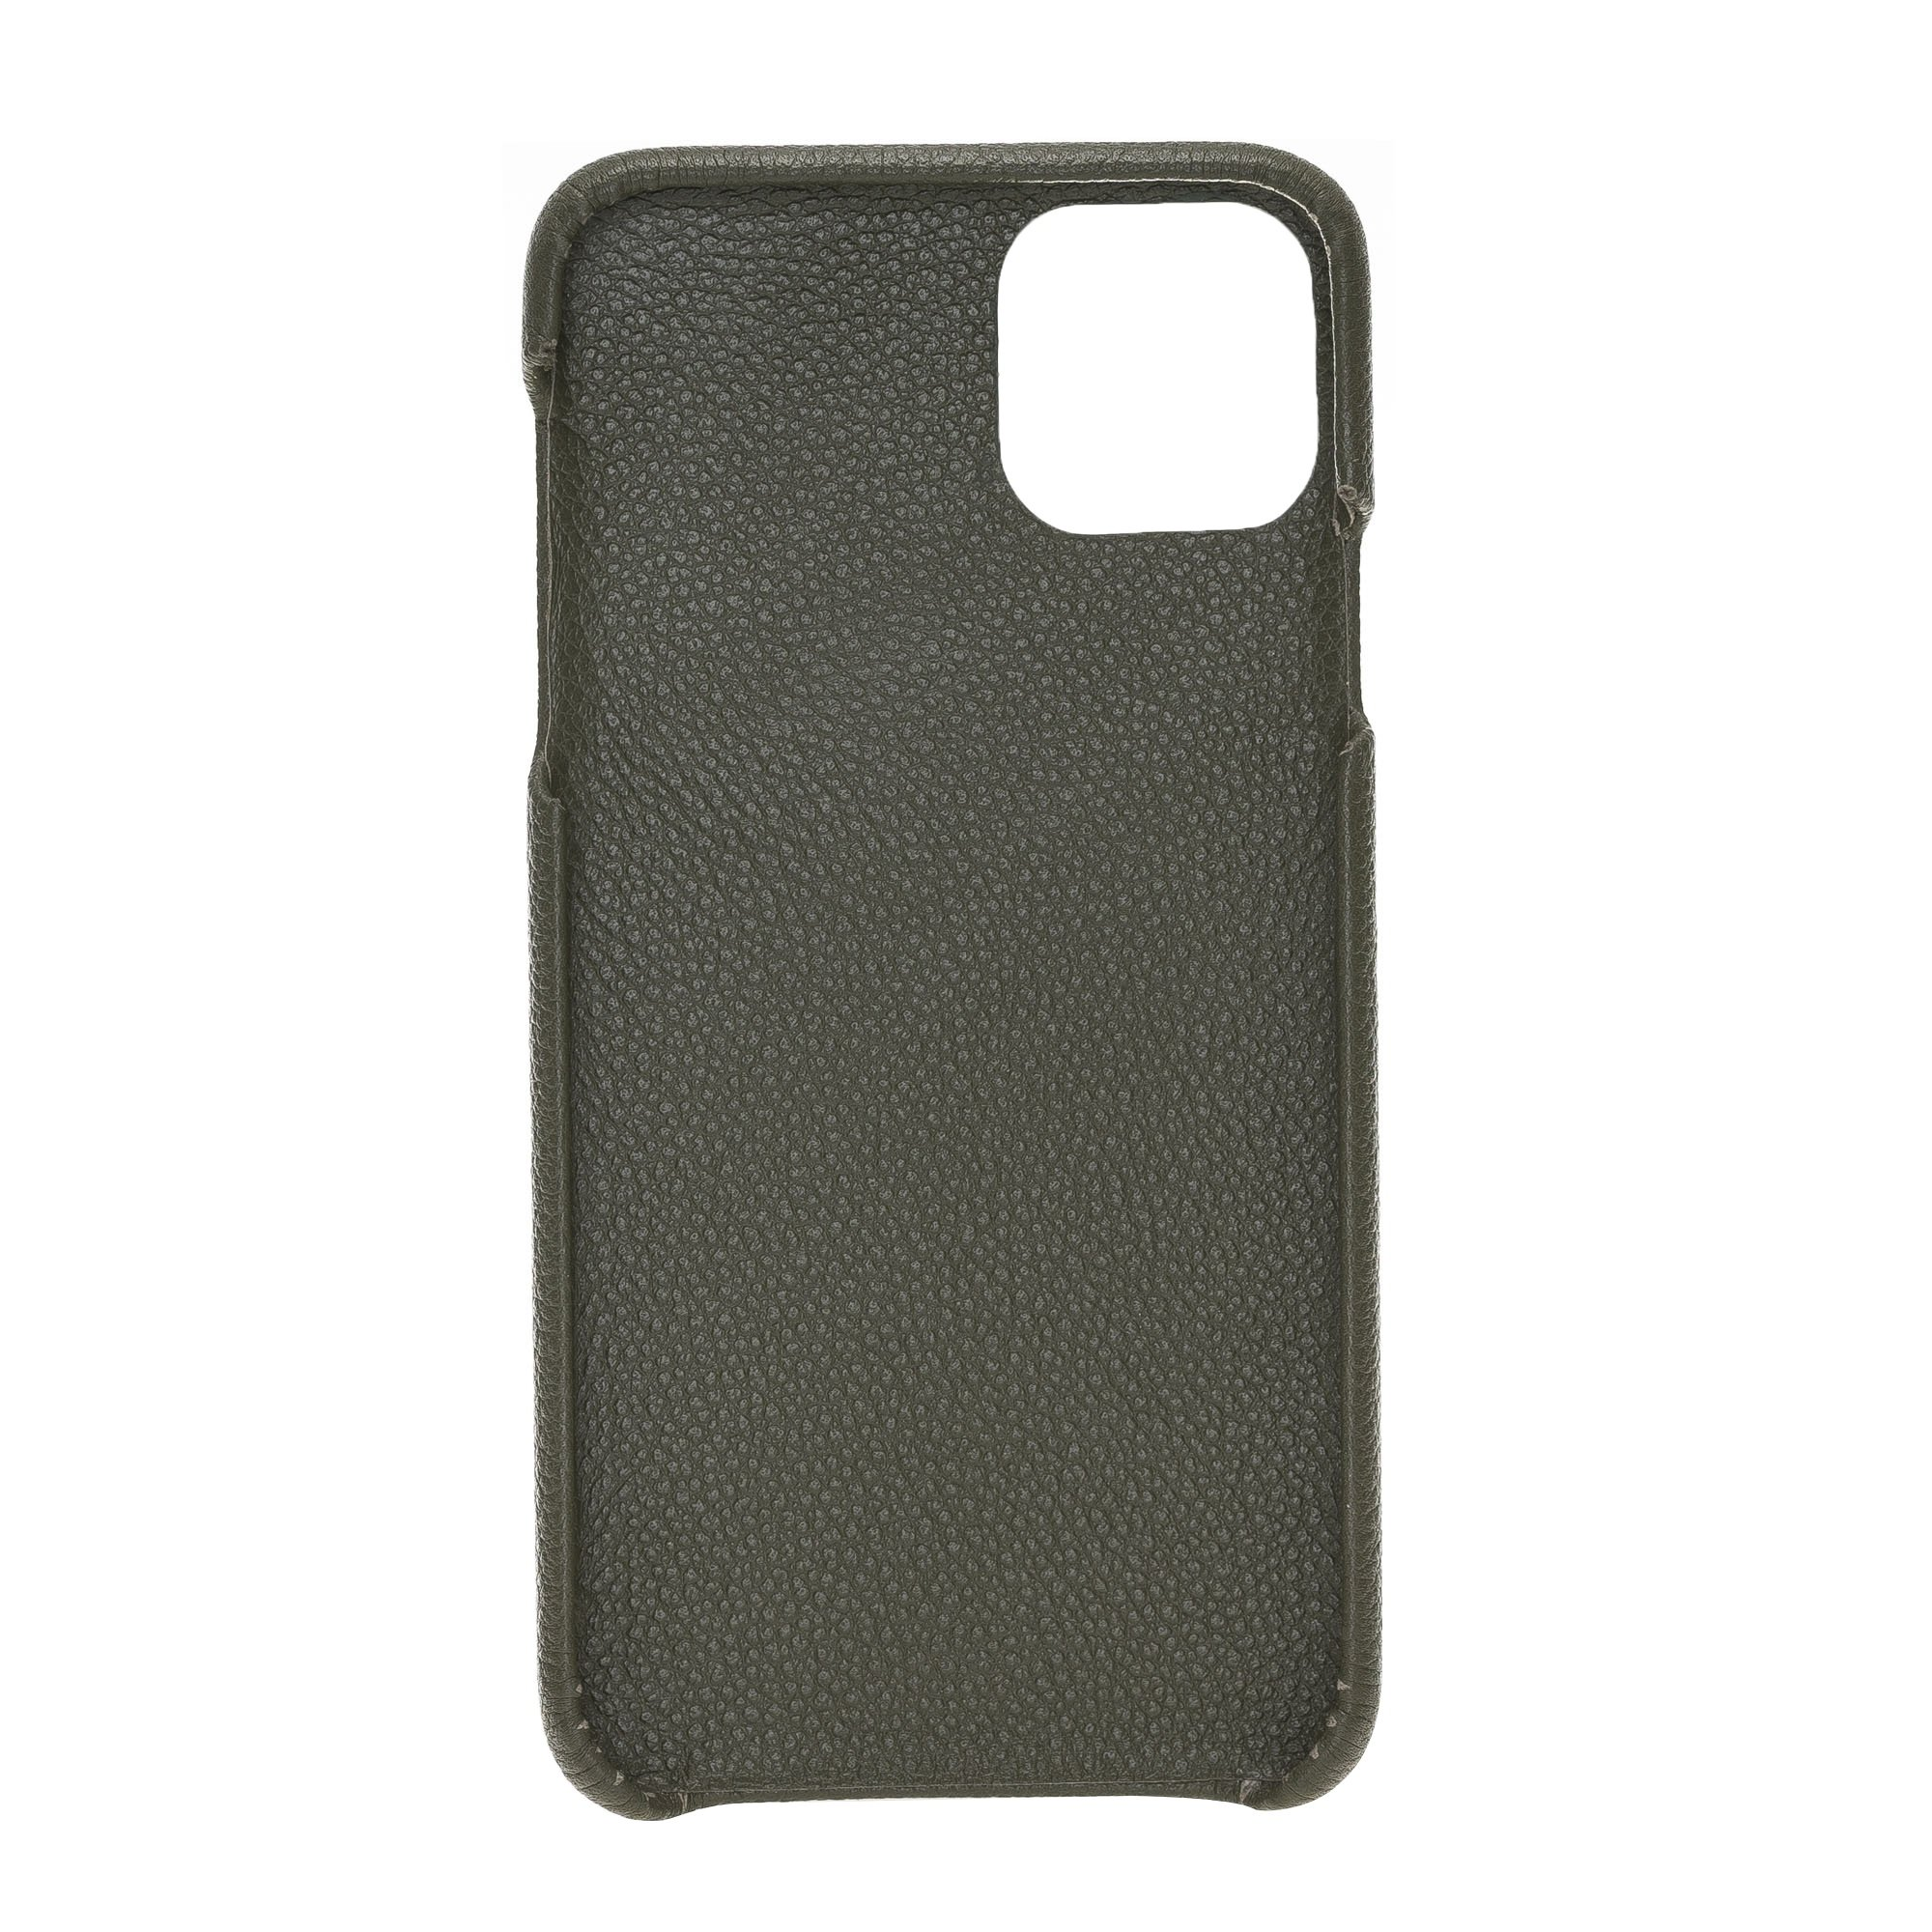 Solo Pelle Lederhülle kompatibel für iPhone 11 Pro Max 6.5 Zoll abnehmbare Hülle (2in1) (Vollleder Nachtgrün)